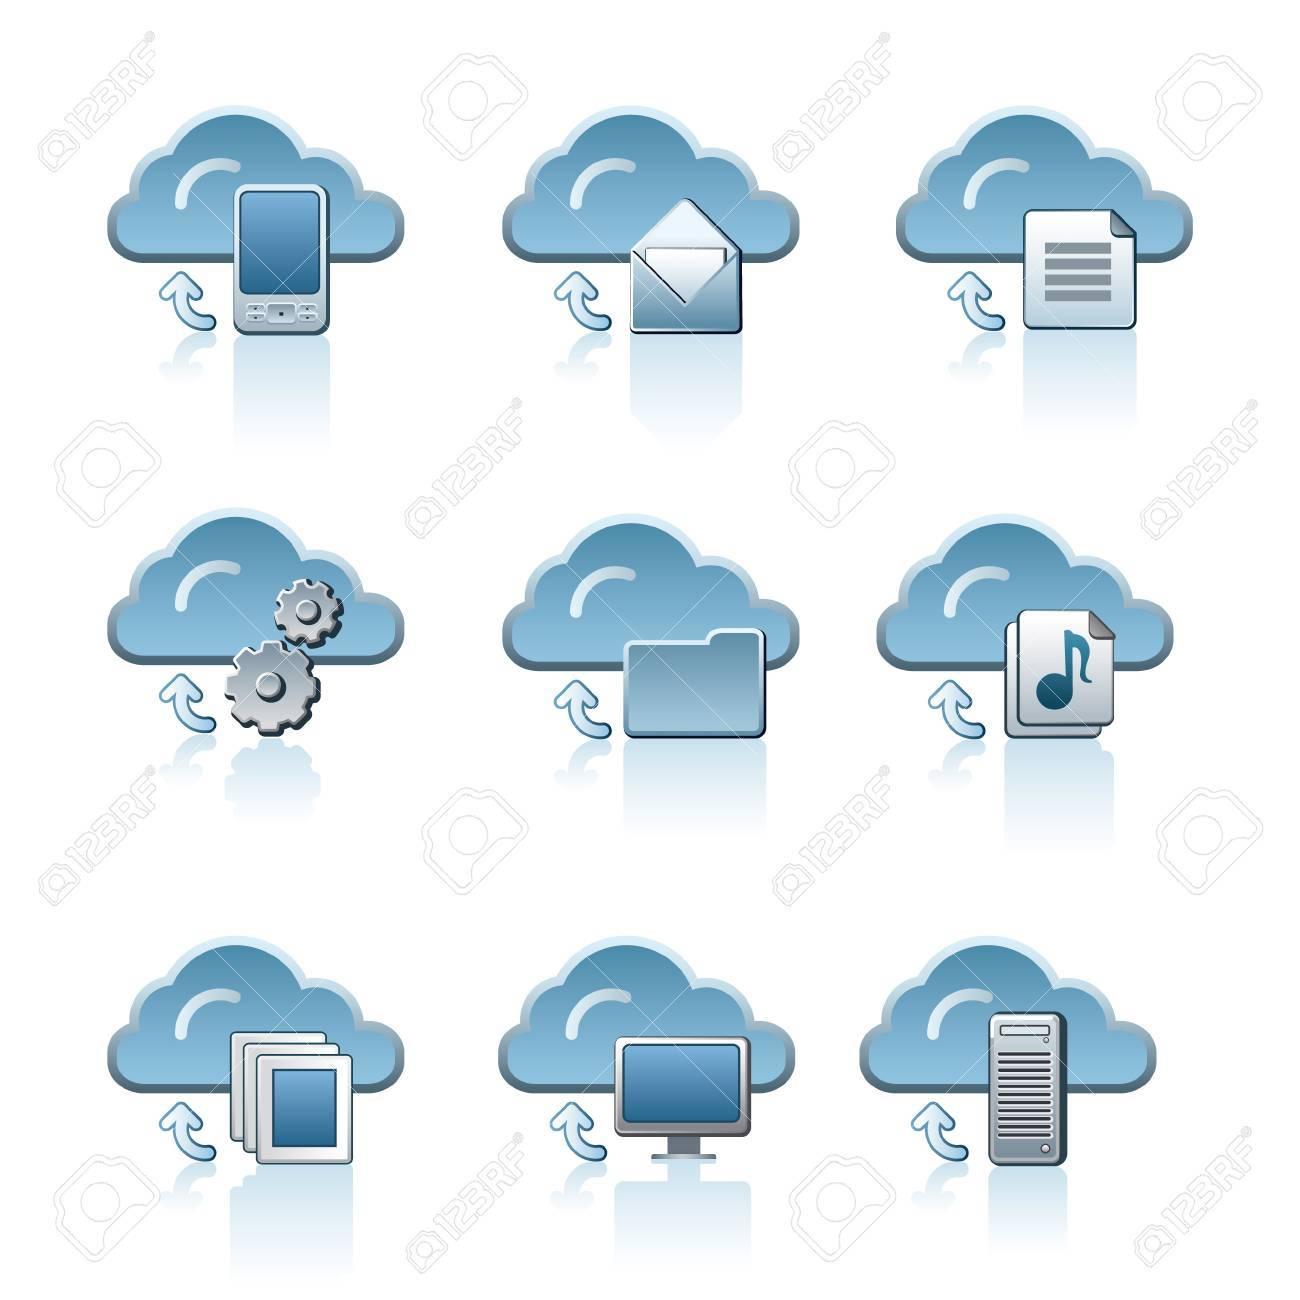 Cloud service icon set Stock Vector - 19234370